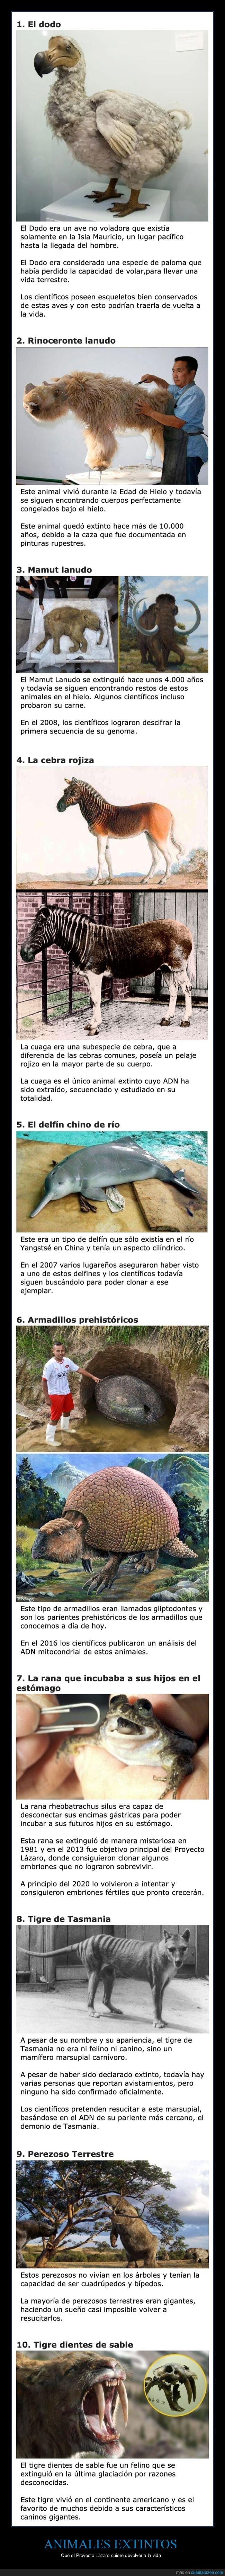 animales,extintos,proyecto lázaro